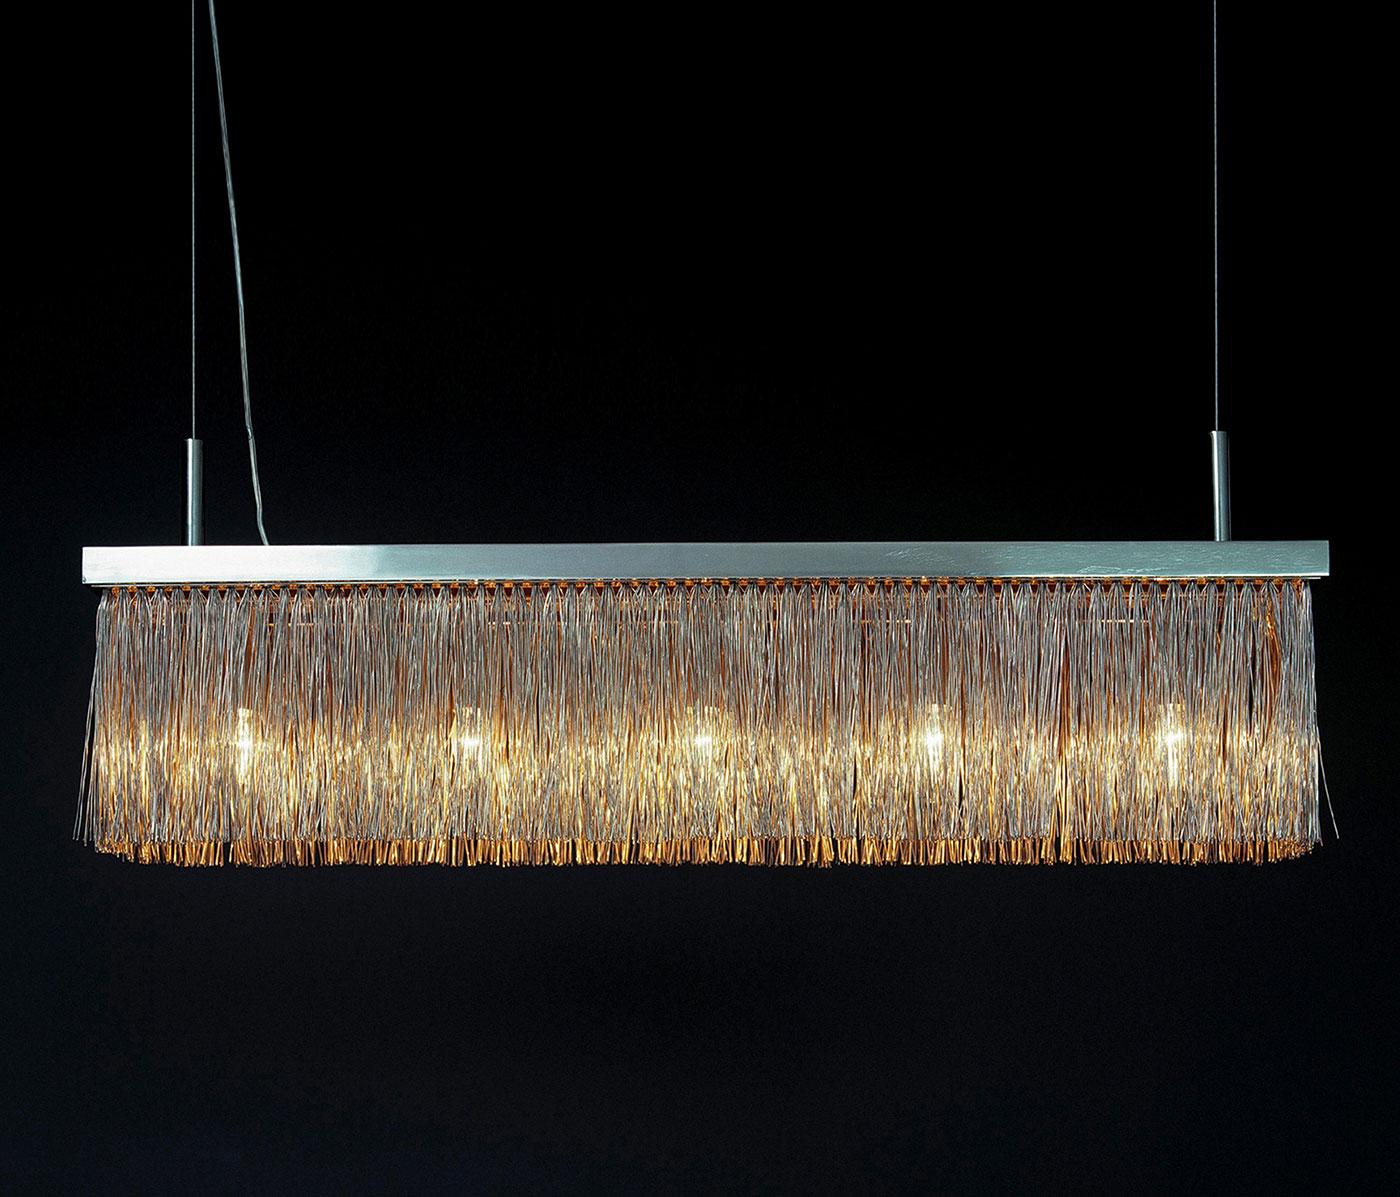 Obegi Home Lighting Brand Van Egmond broom hanginglamp